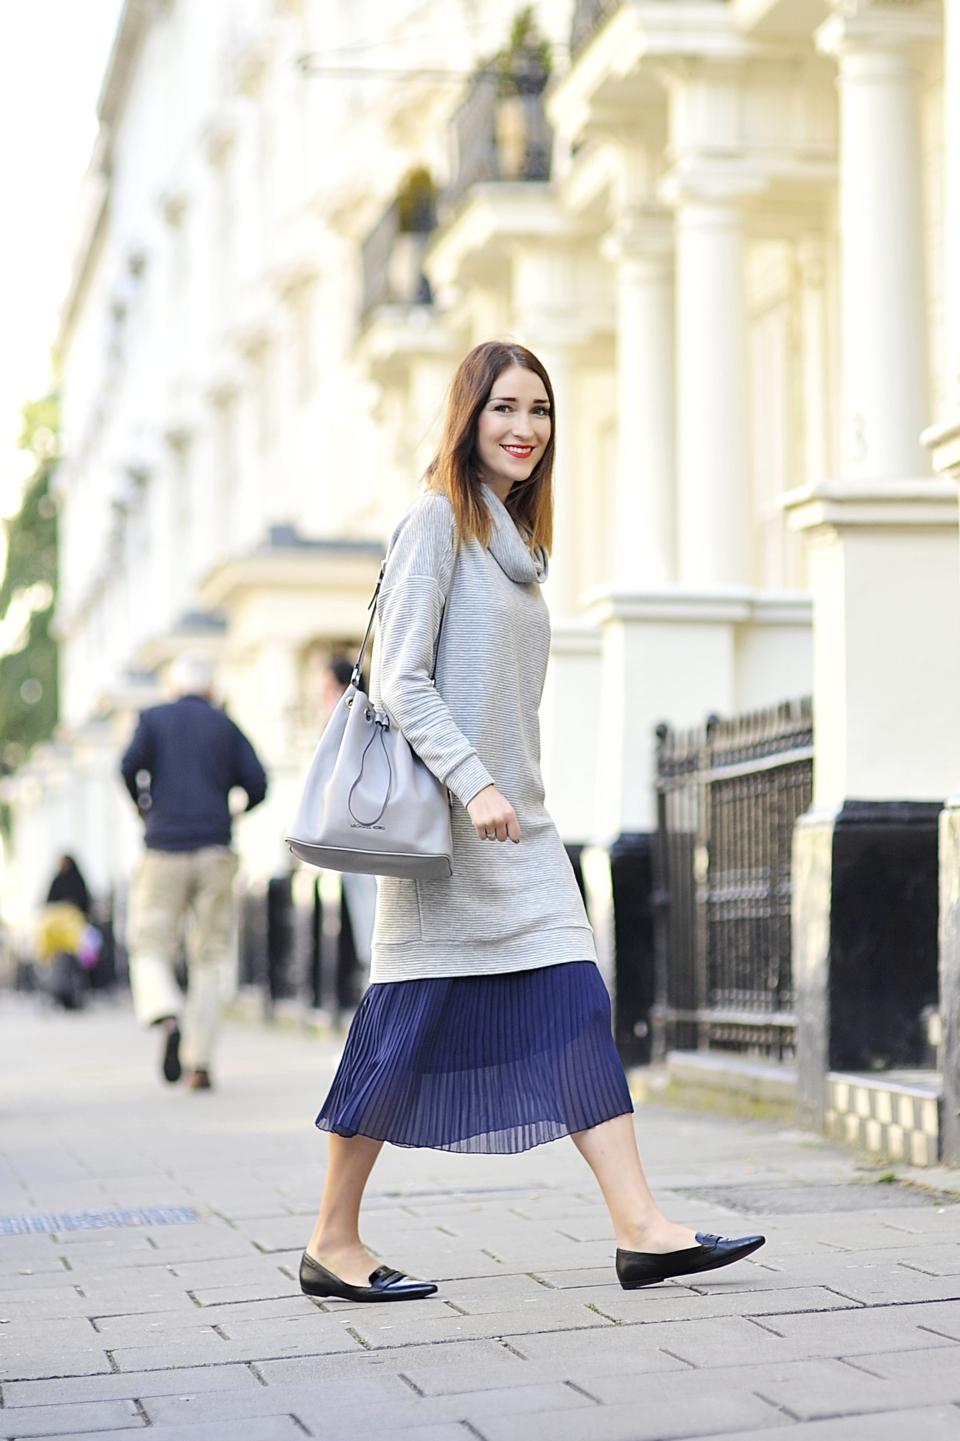 plisowana spódnica jak nosić 04 Shiny Syl blog